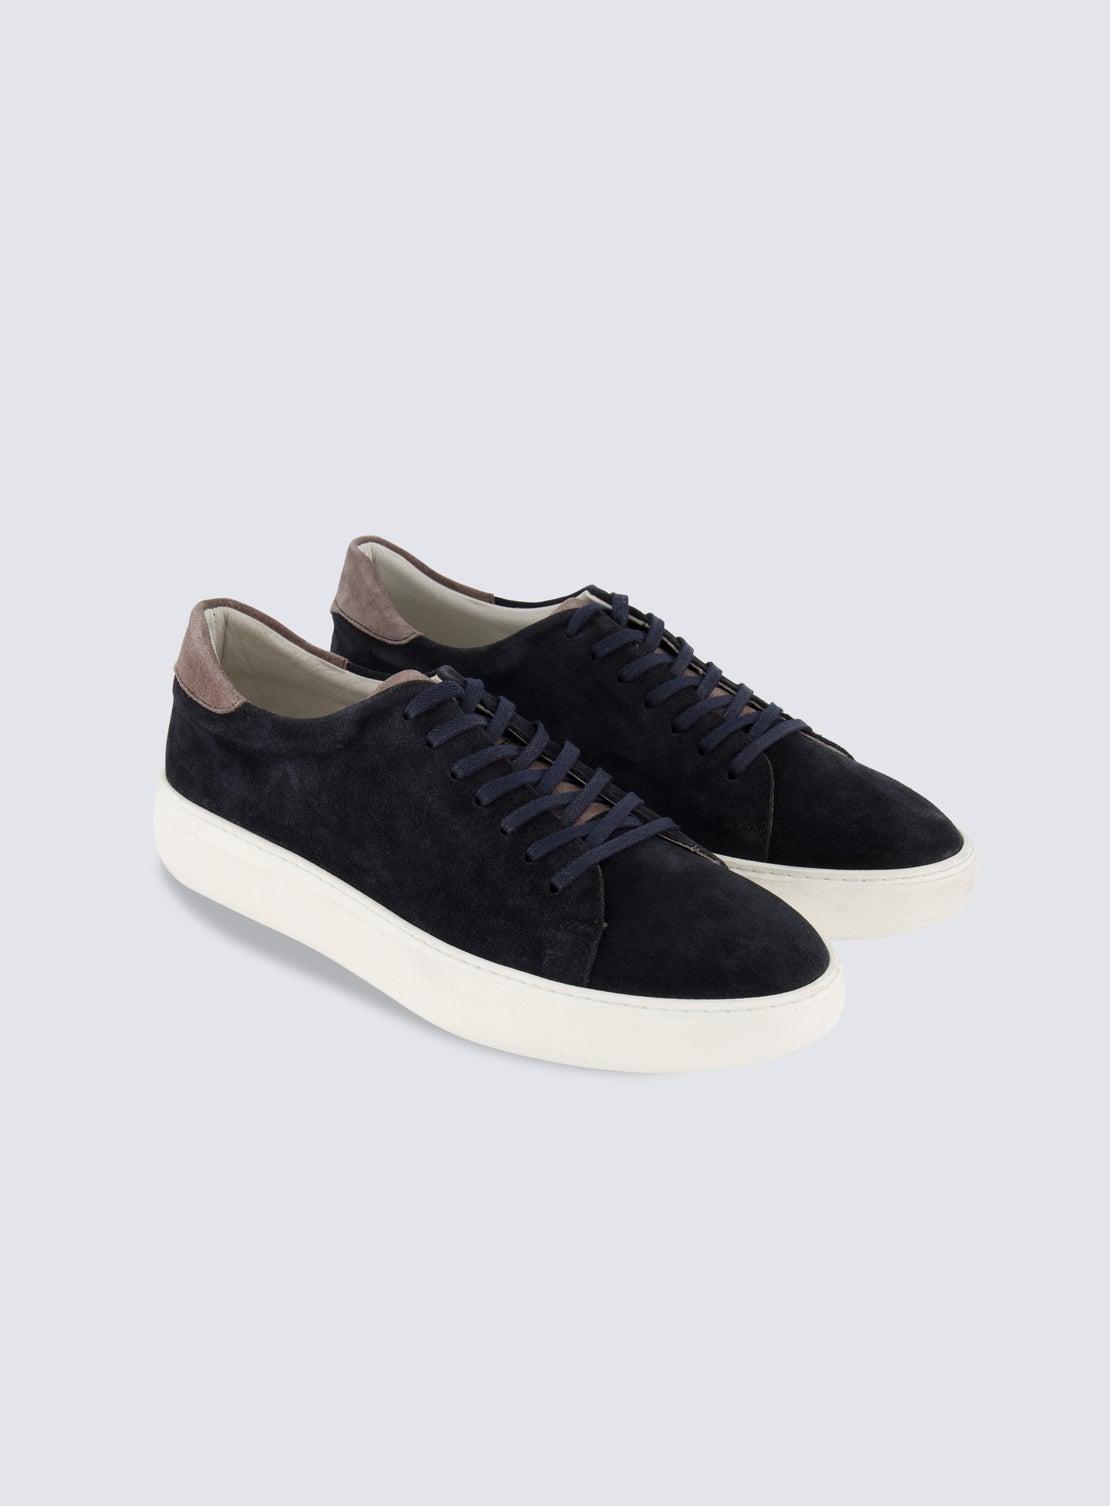 Thom Blue Suede Sneaker